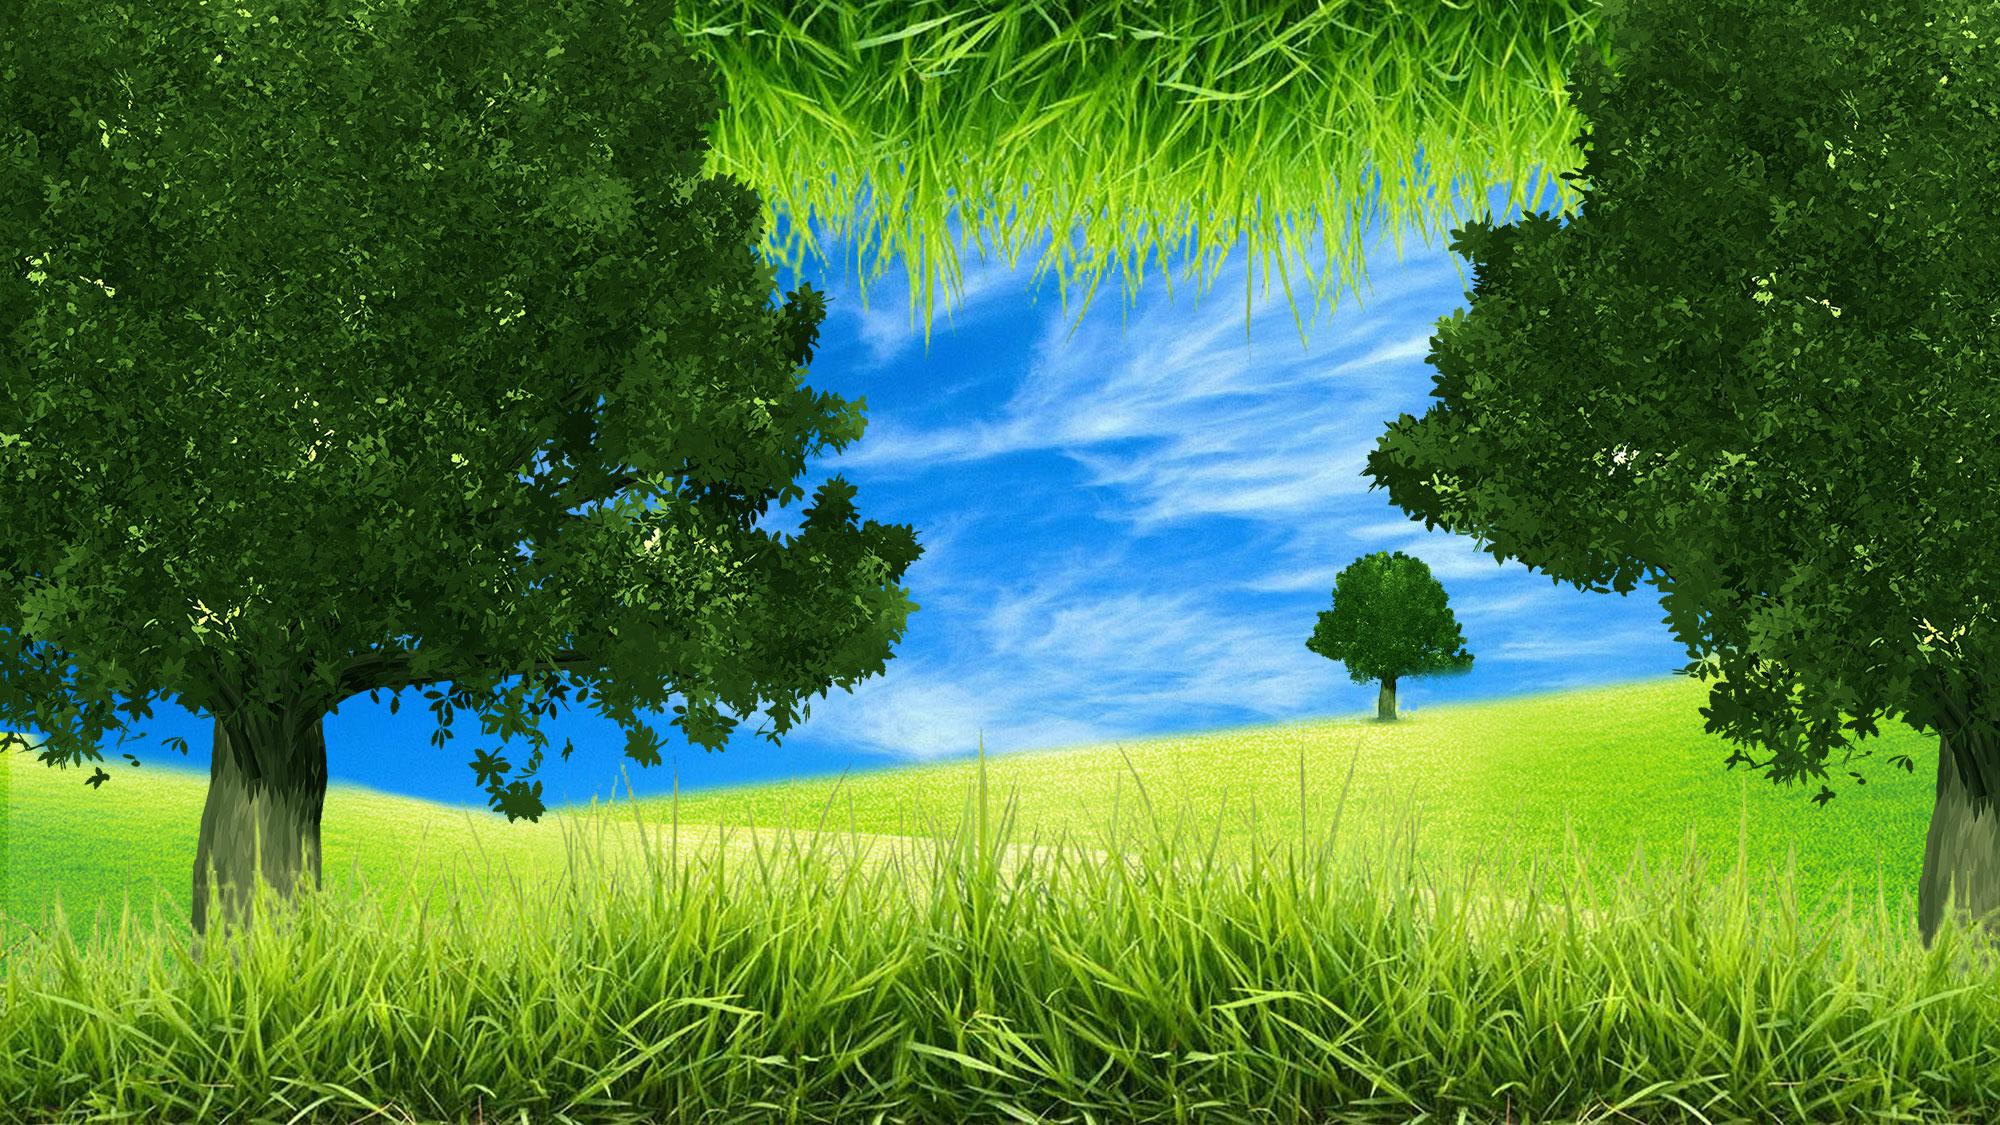 A scenery illustration